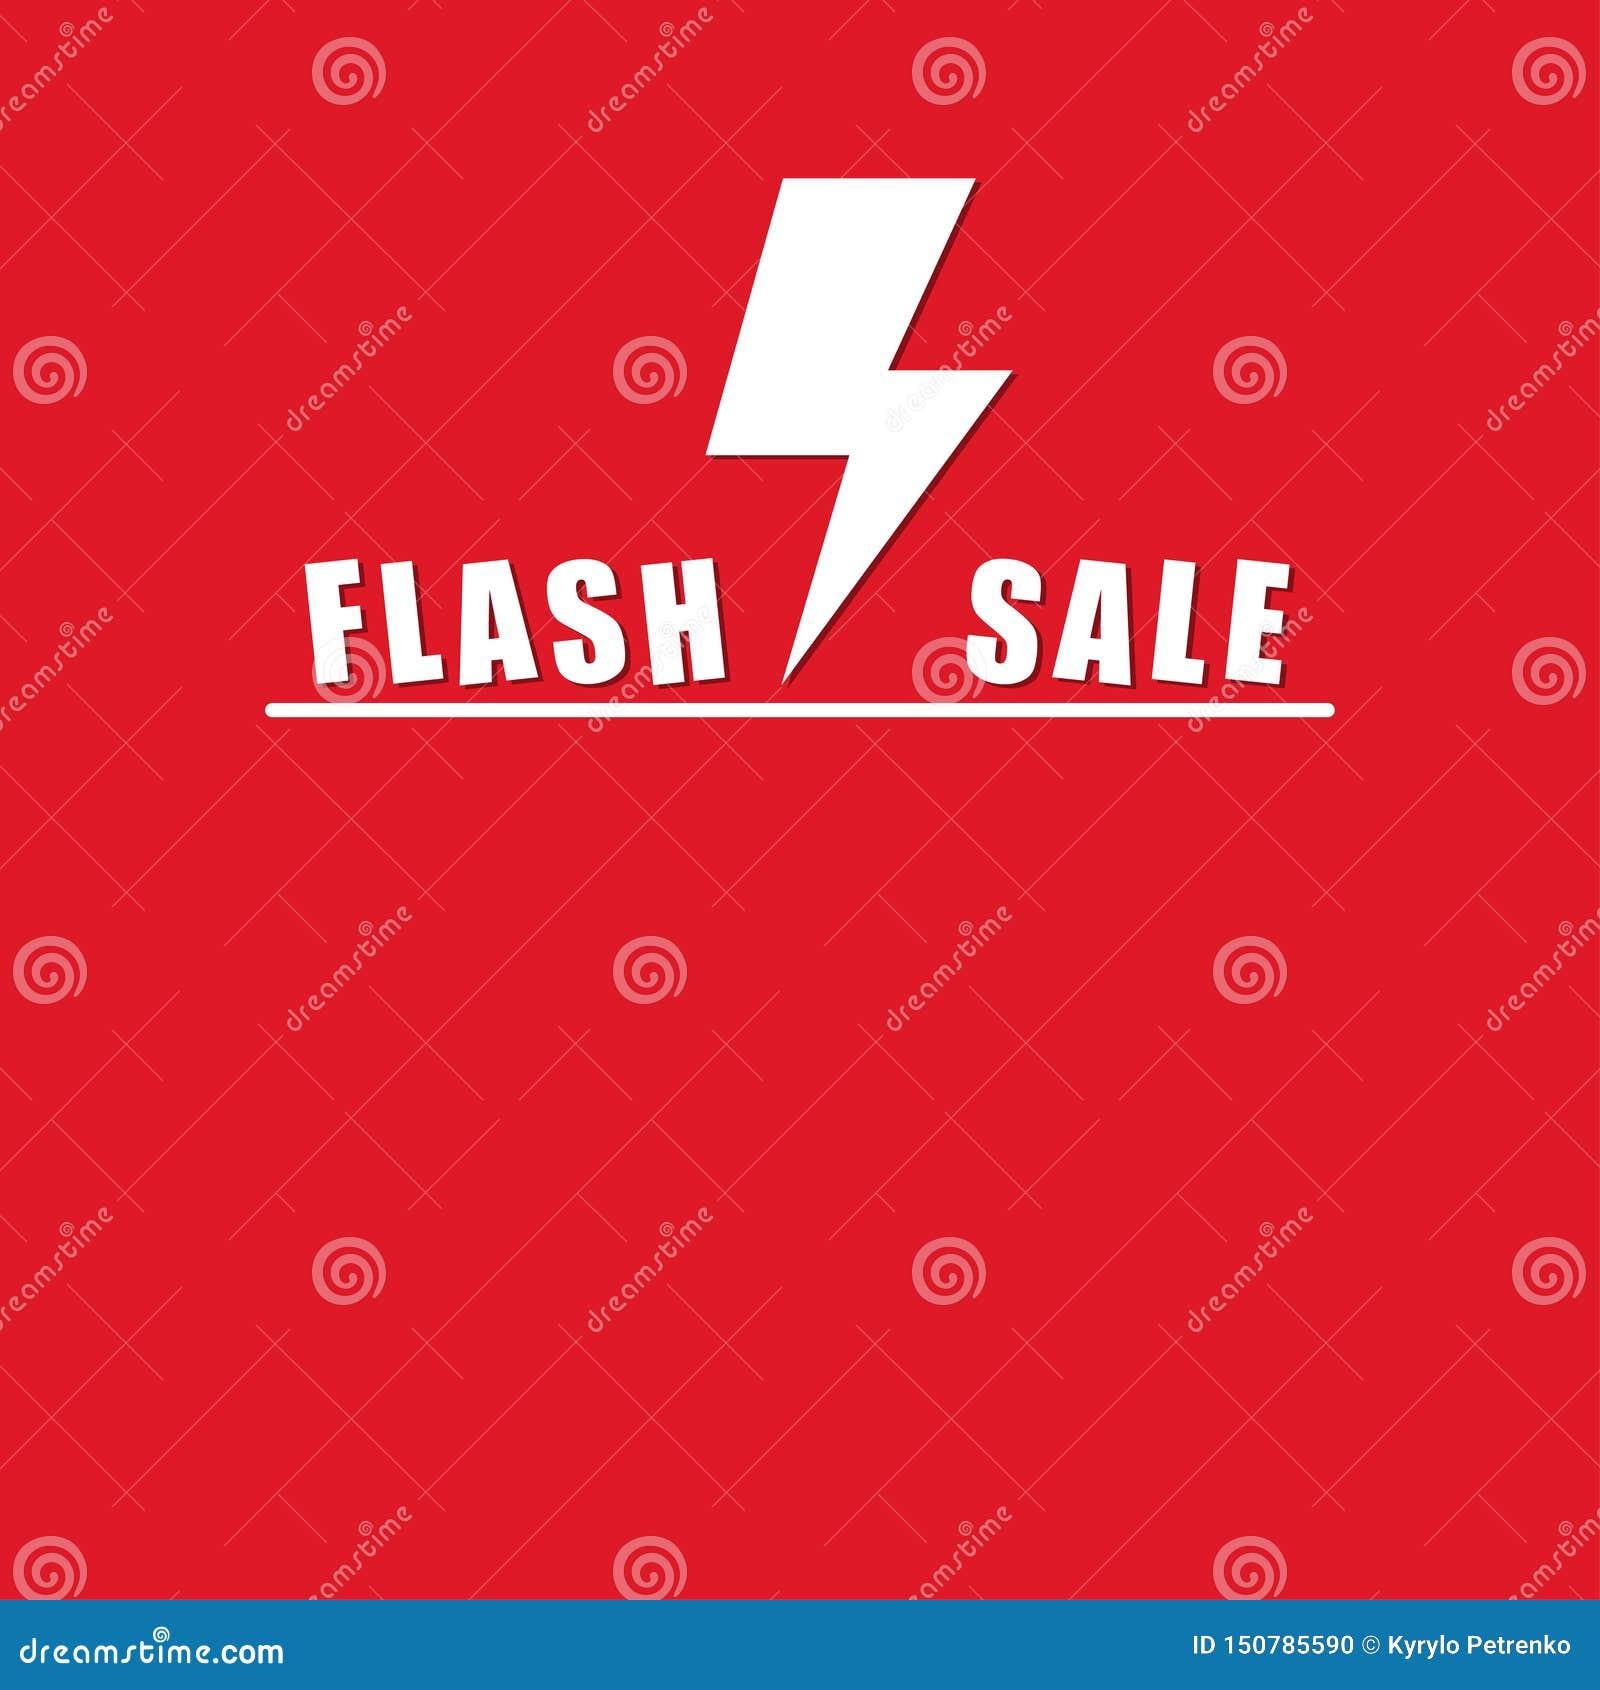 Flash sale on red background mock up